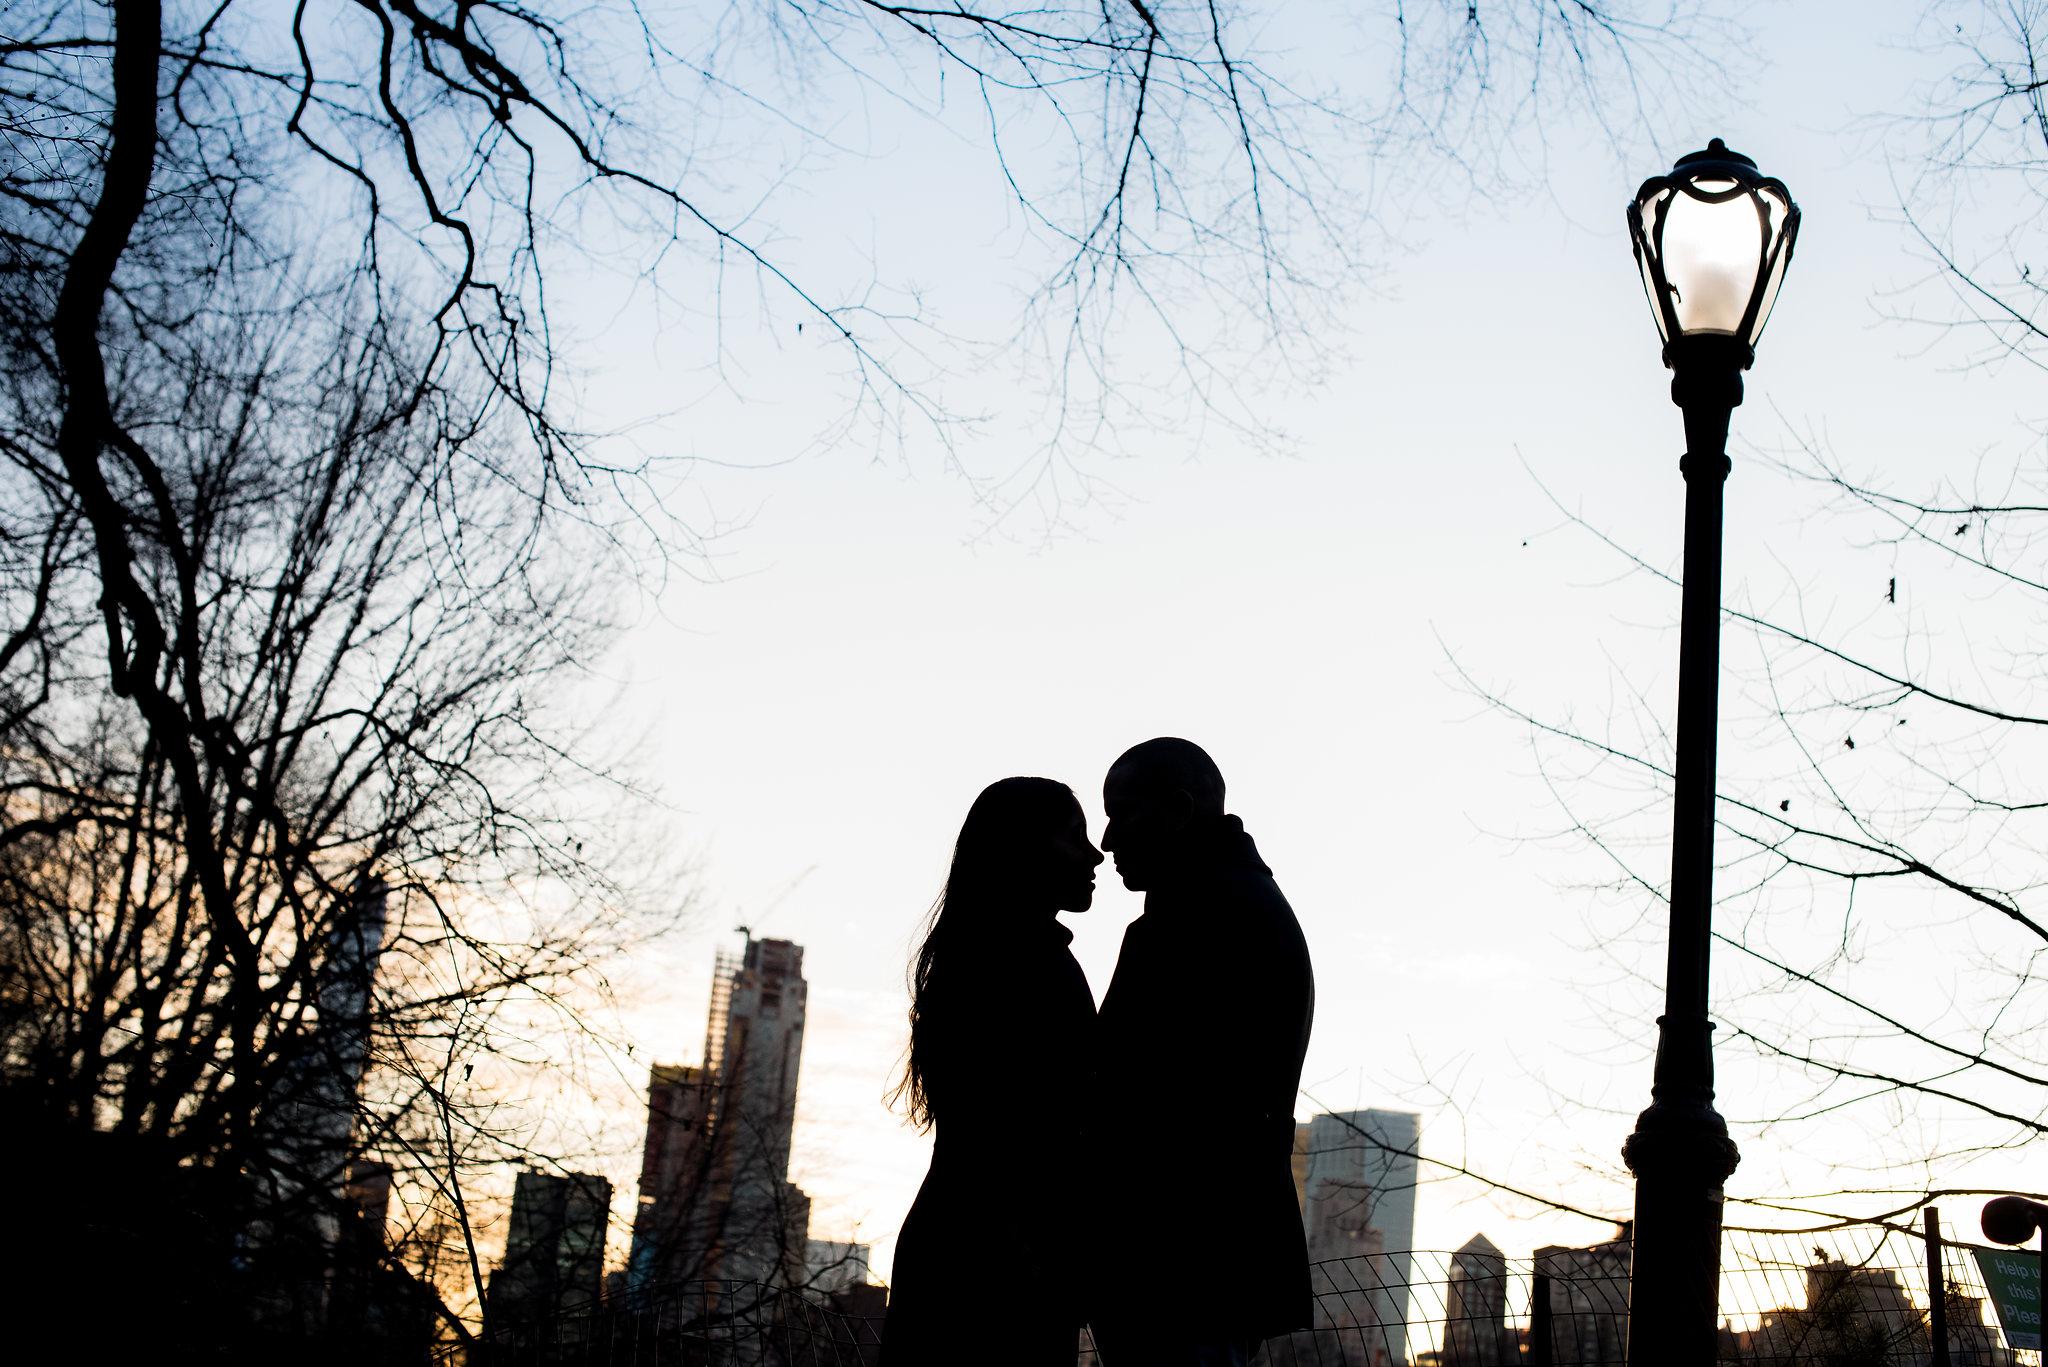 st-augustine-wedding-photographer-new-york-city-engagement-photographer-sarah-annay-photography.jpg